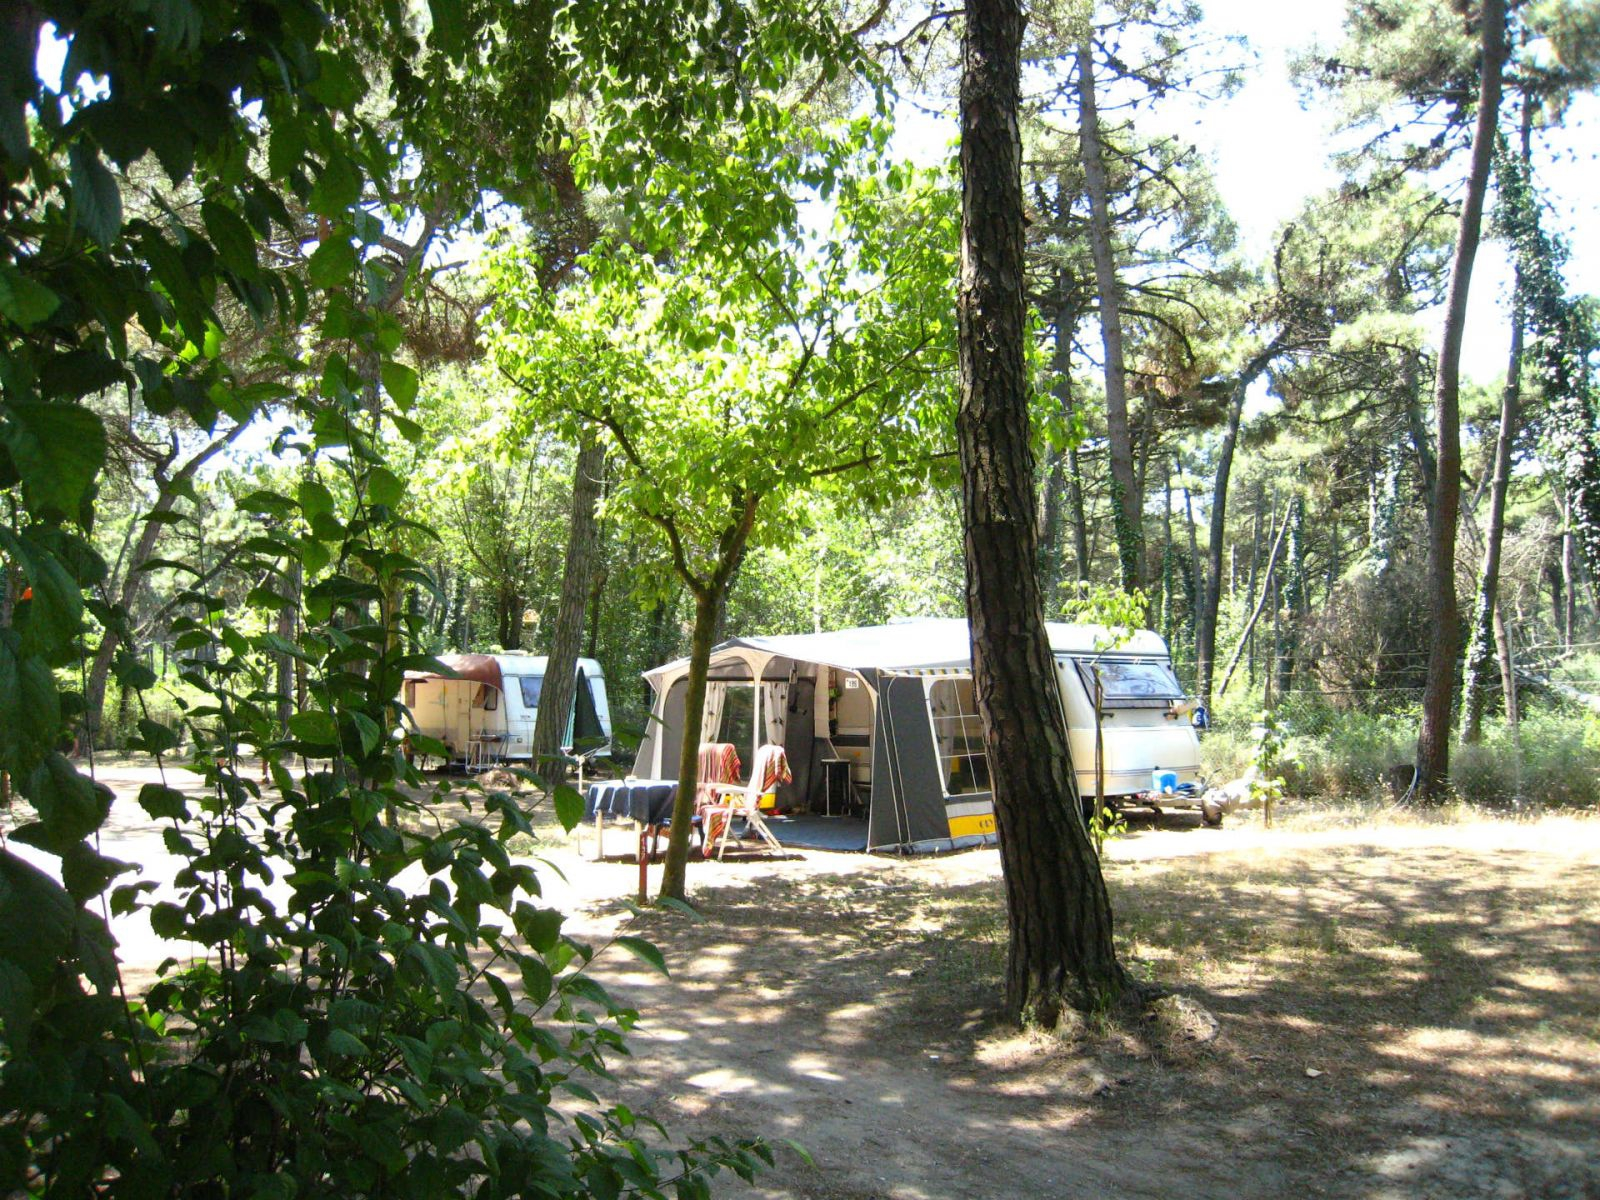 Green Mission Piomboni Camping Village Marina di Ravenna